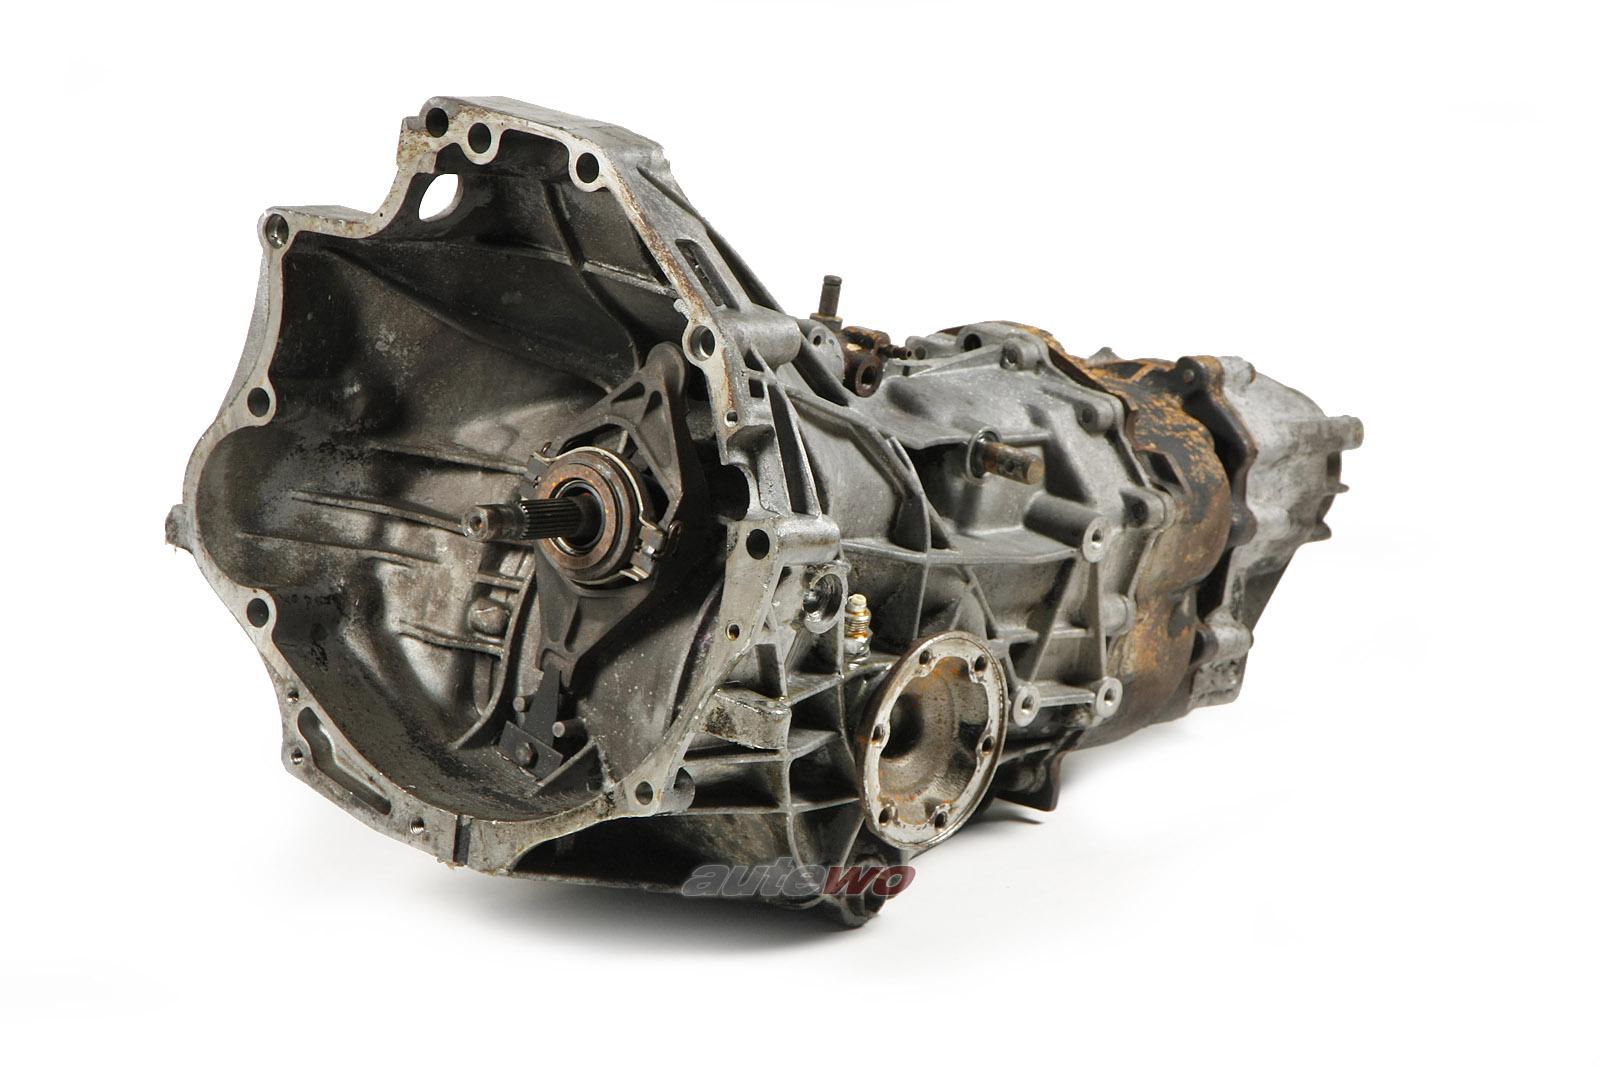 016300047JX Audi 100/200 Typ 44 2.2/2.23l Getriebe 5-Gang  AAZ 09016